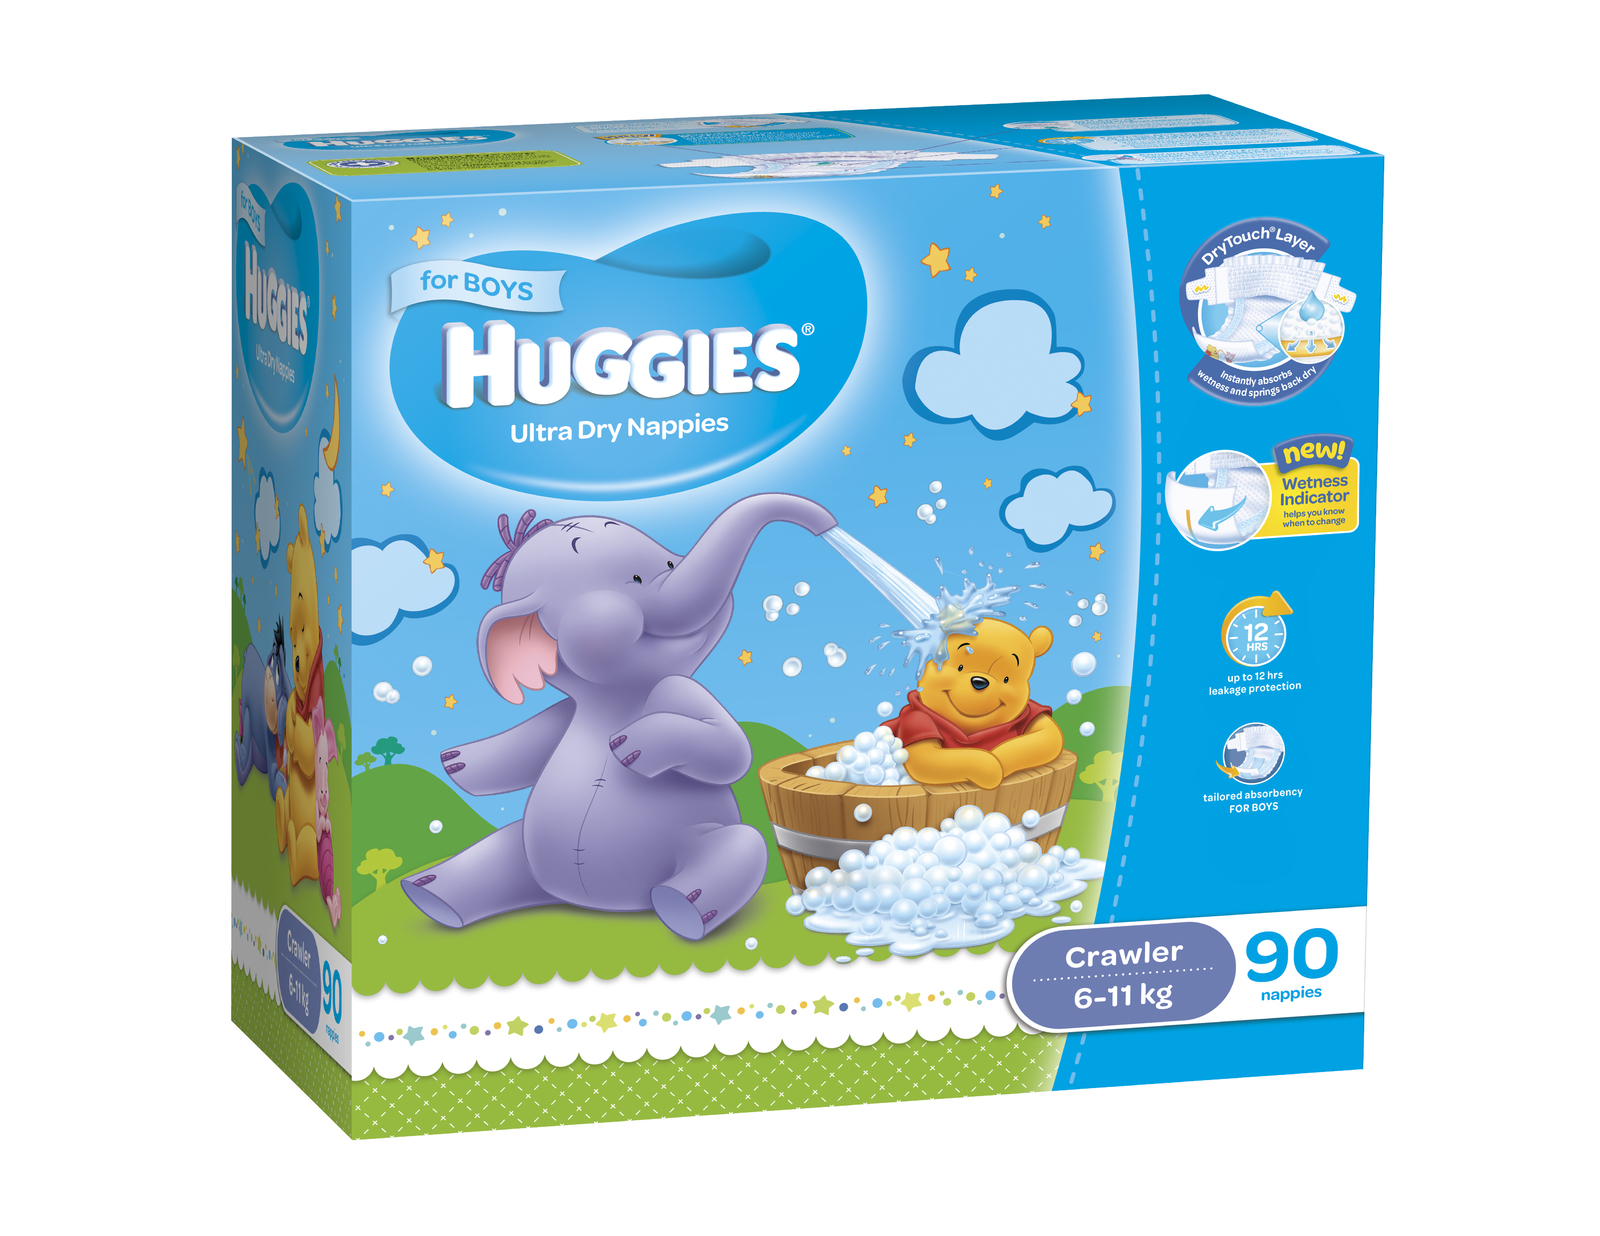 buy huggies nappies jumbo pack crawler boy at mighty ape australia